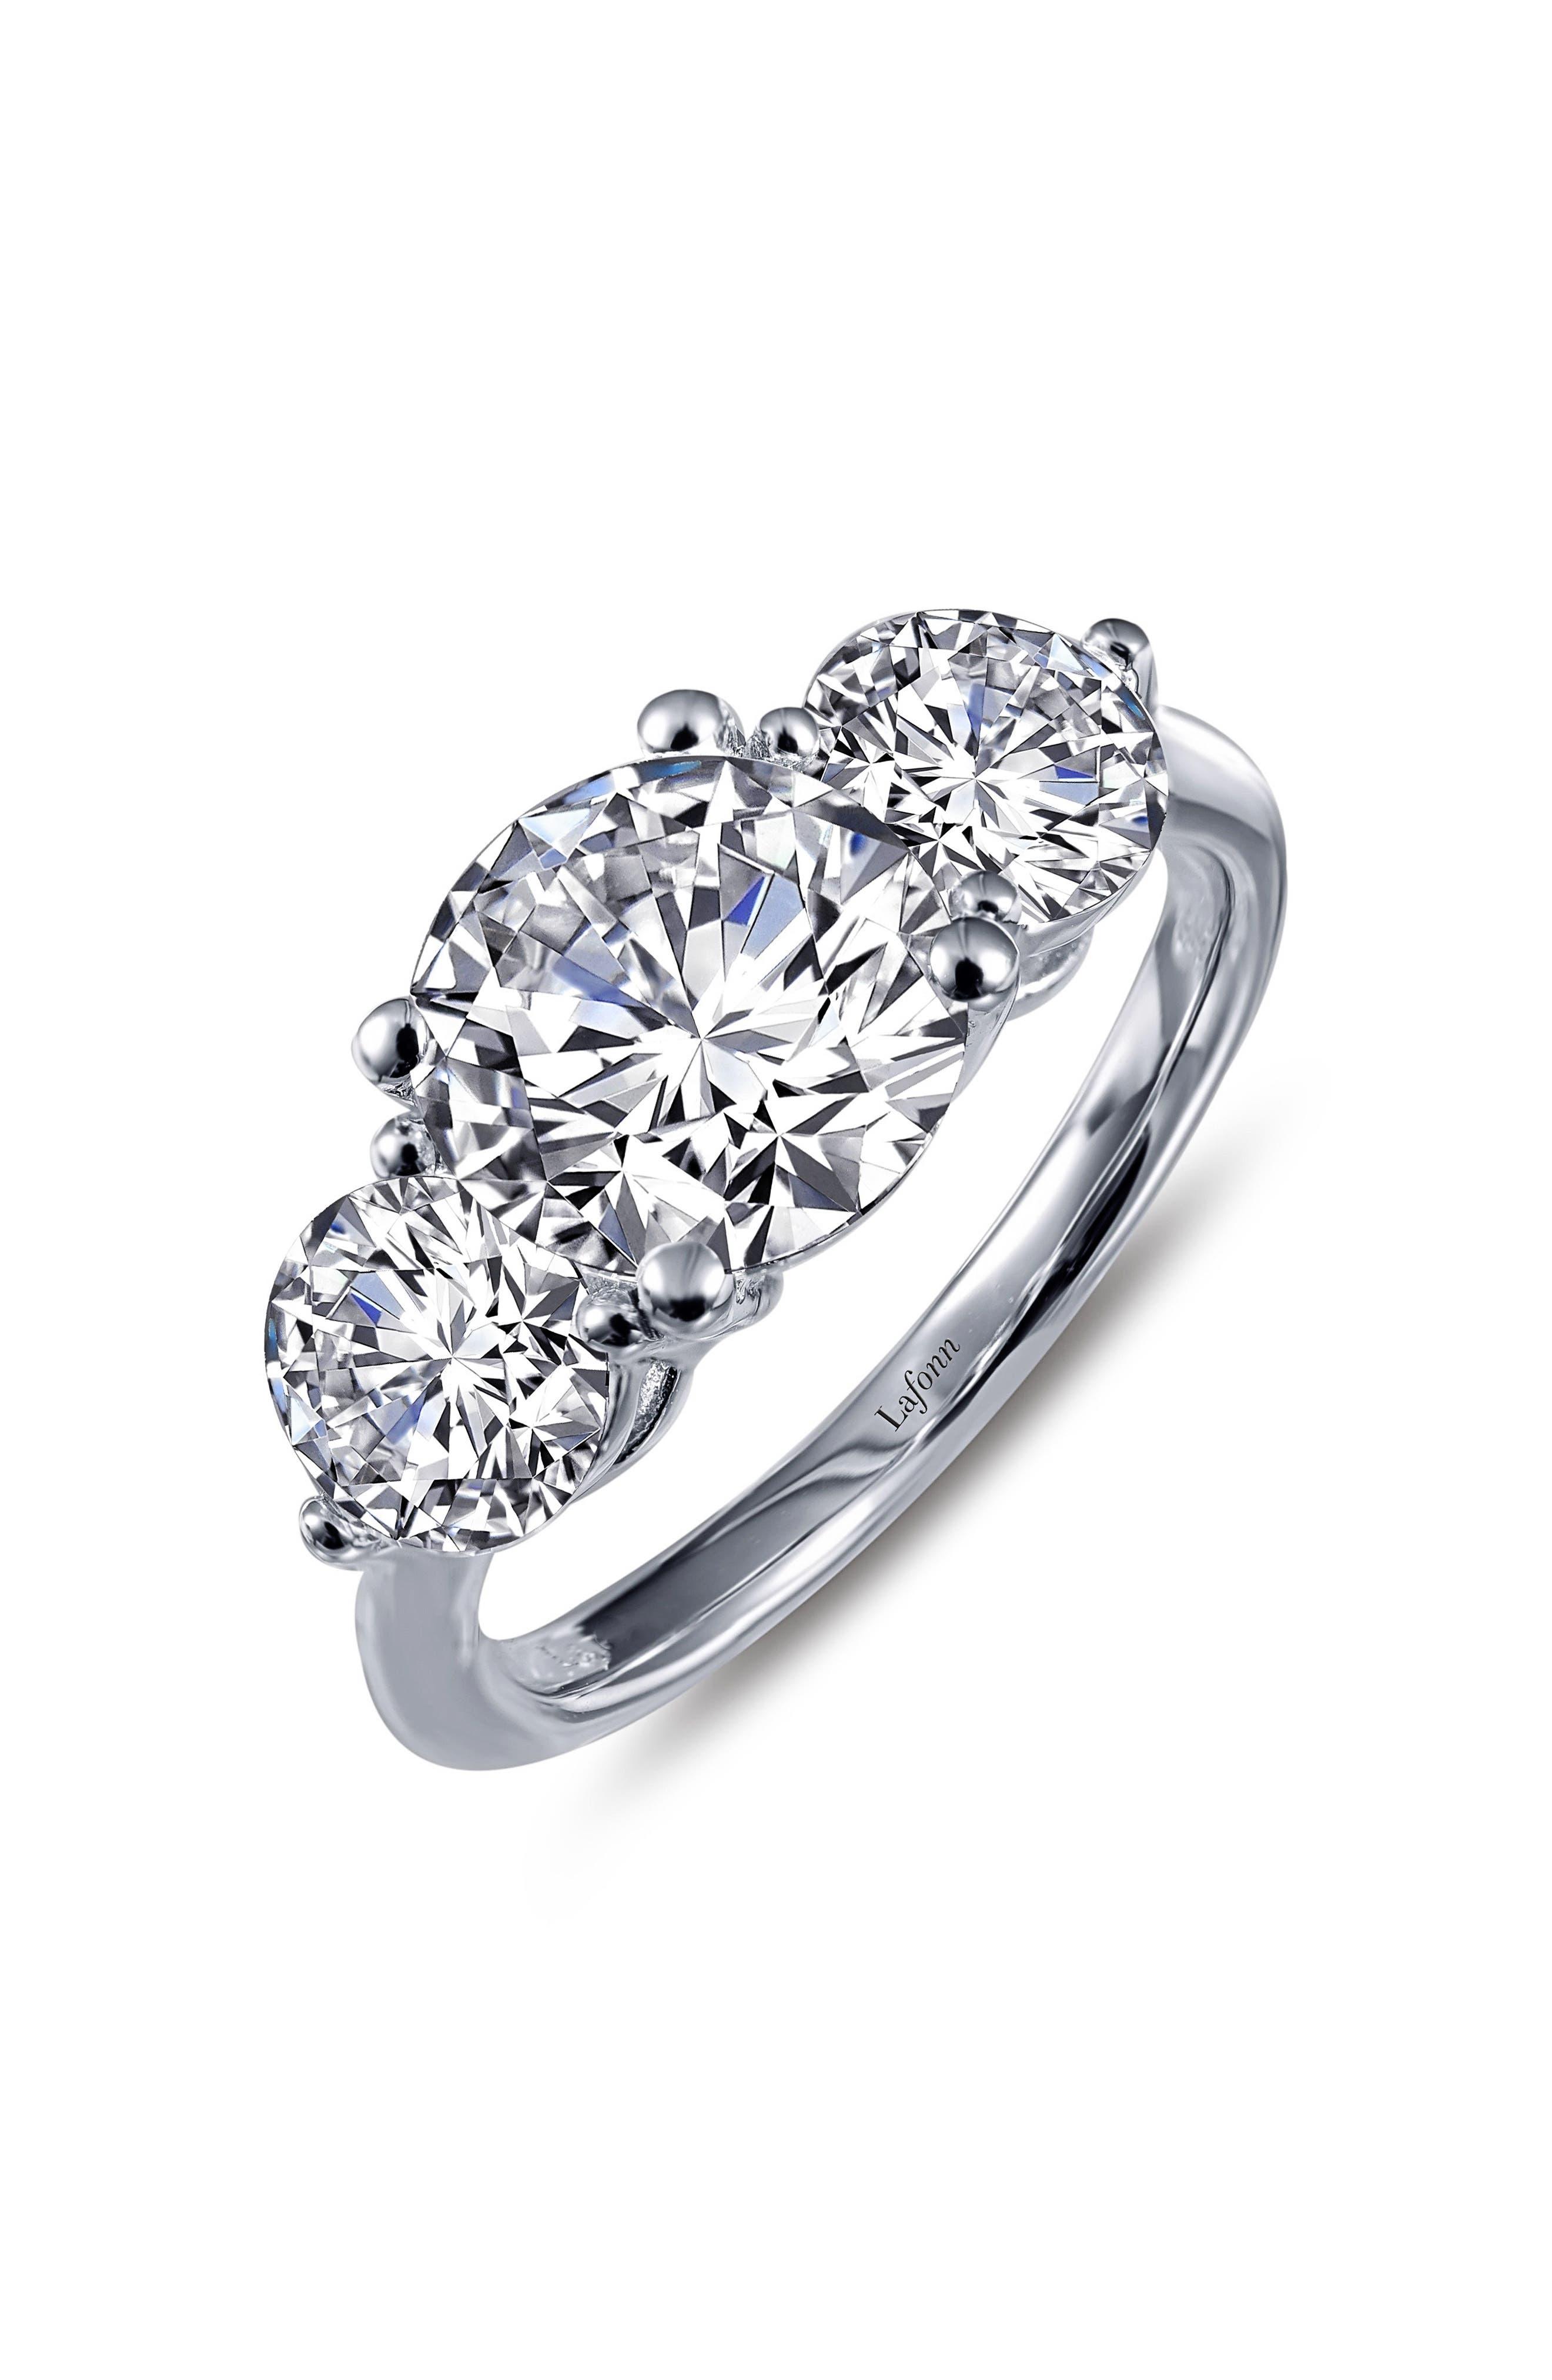 Main Image - Lafonn Simulated Diamond Ring